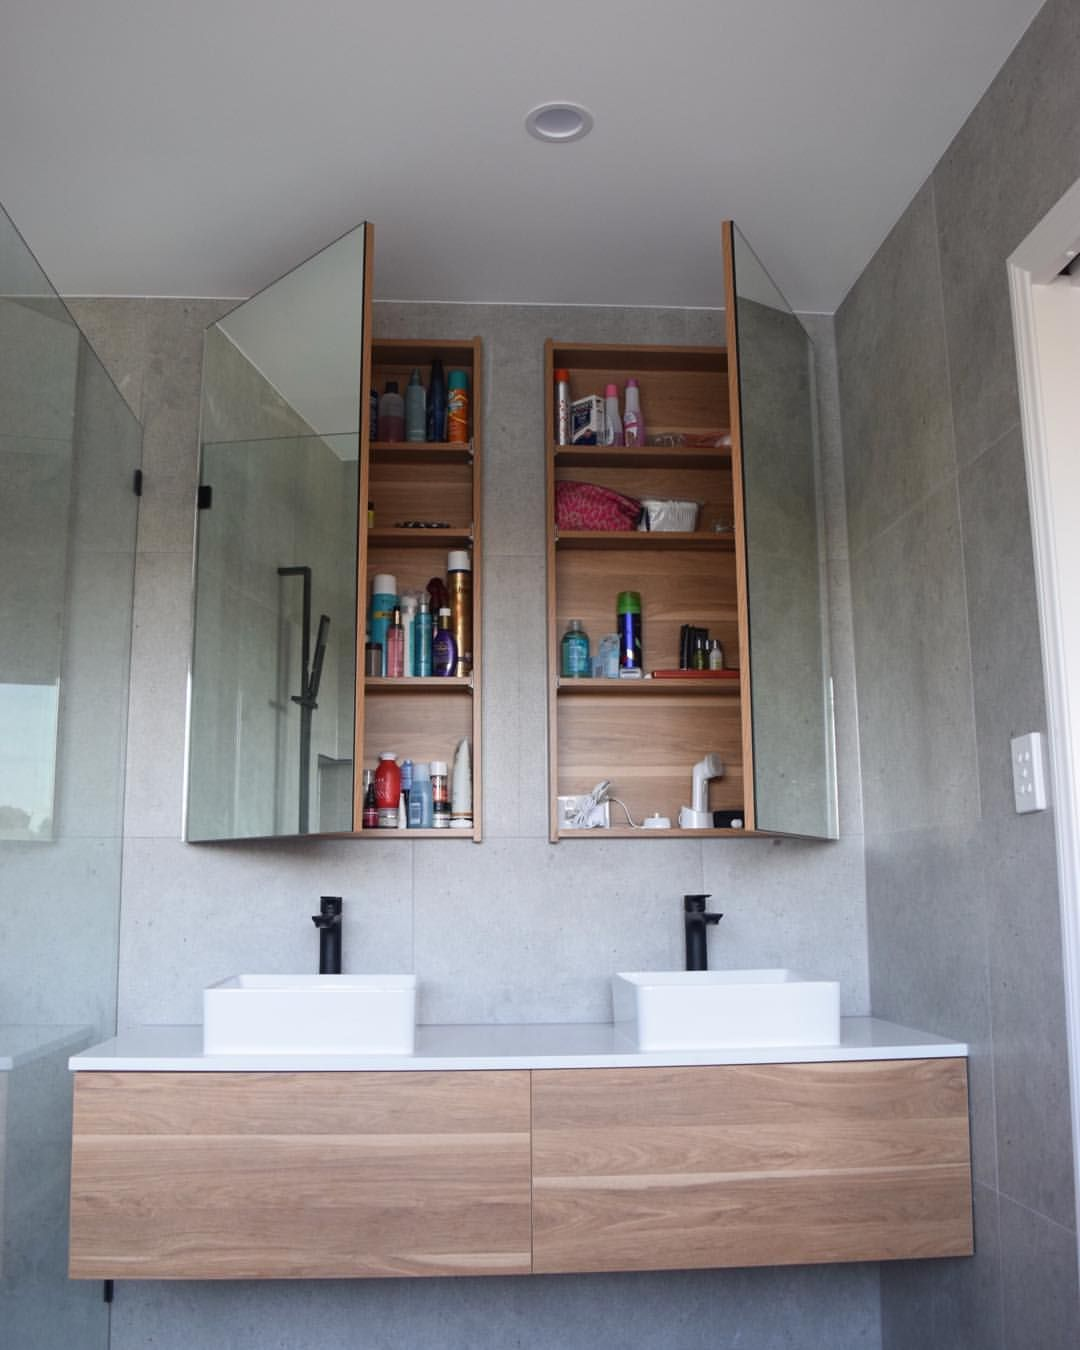 Recessed Cabinet Recessed Cabinet Small Bathroom Remodel Bathroom Renovations